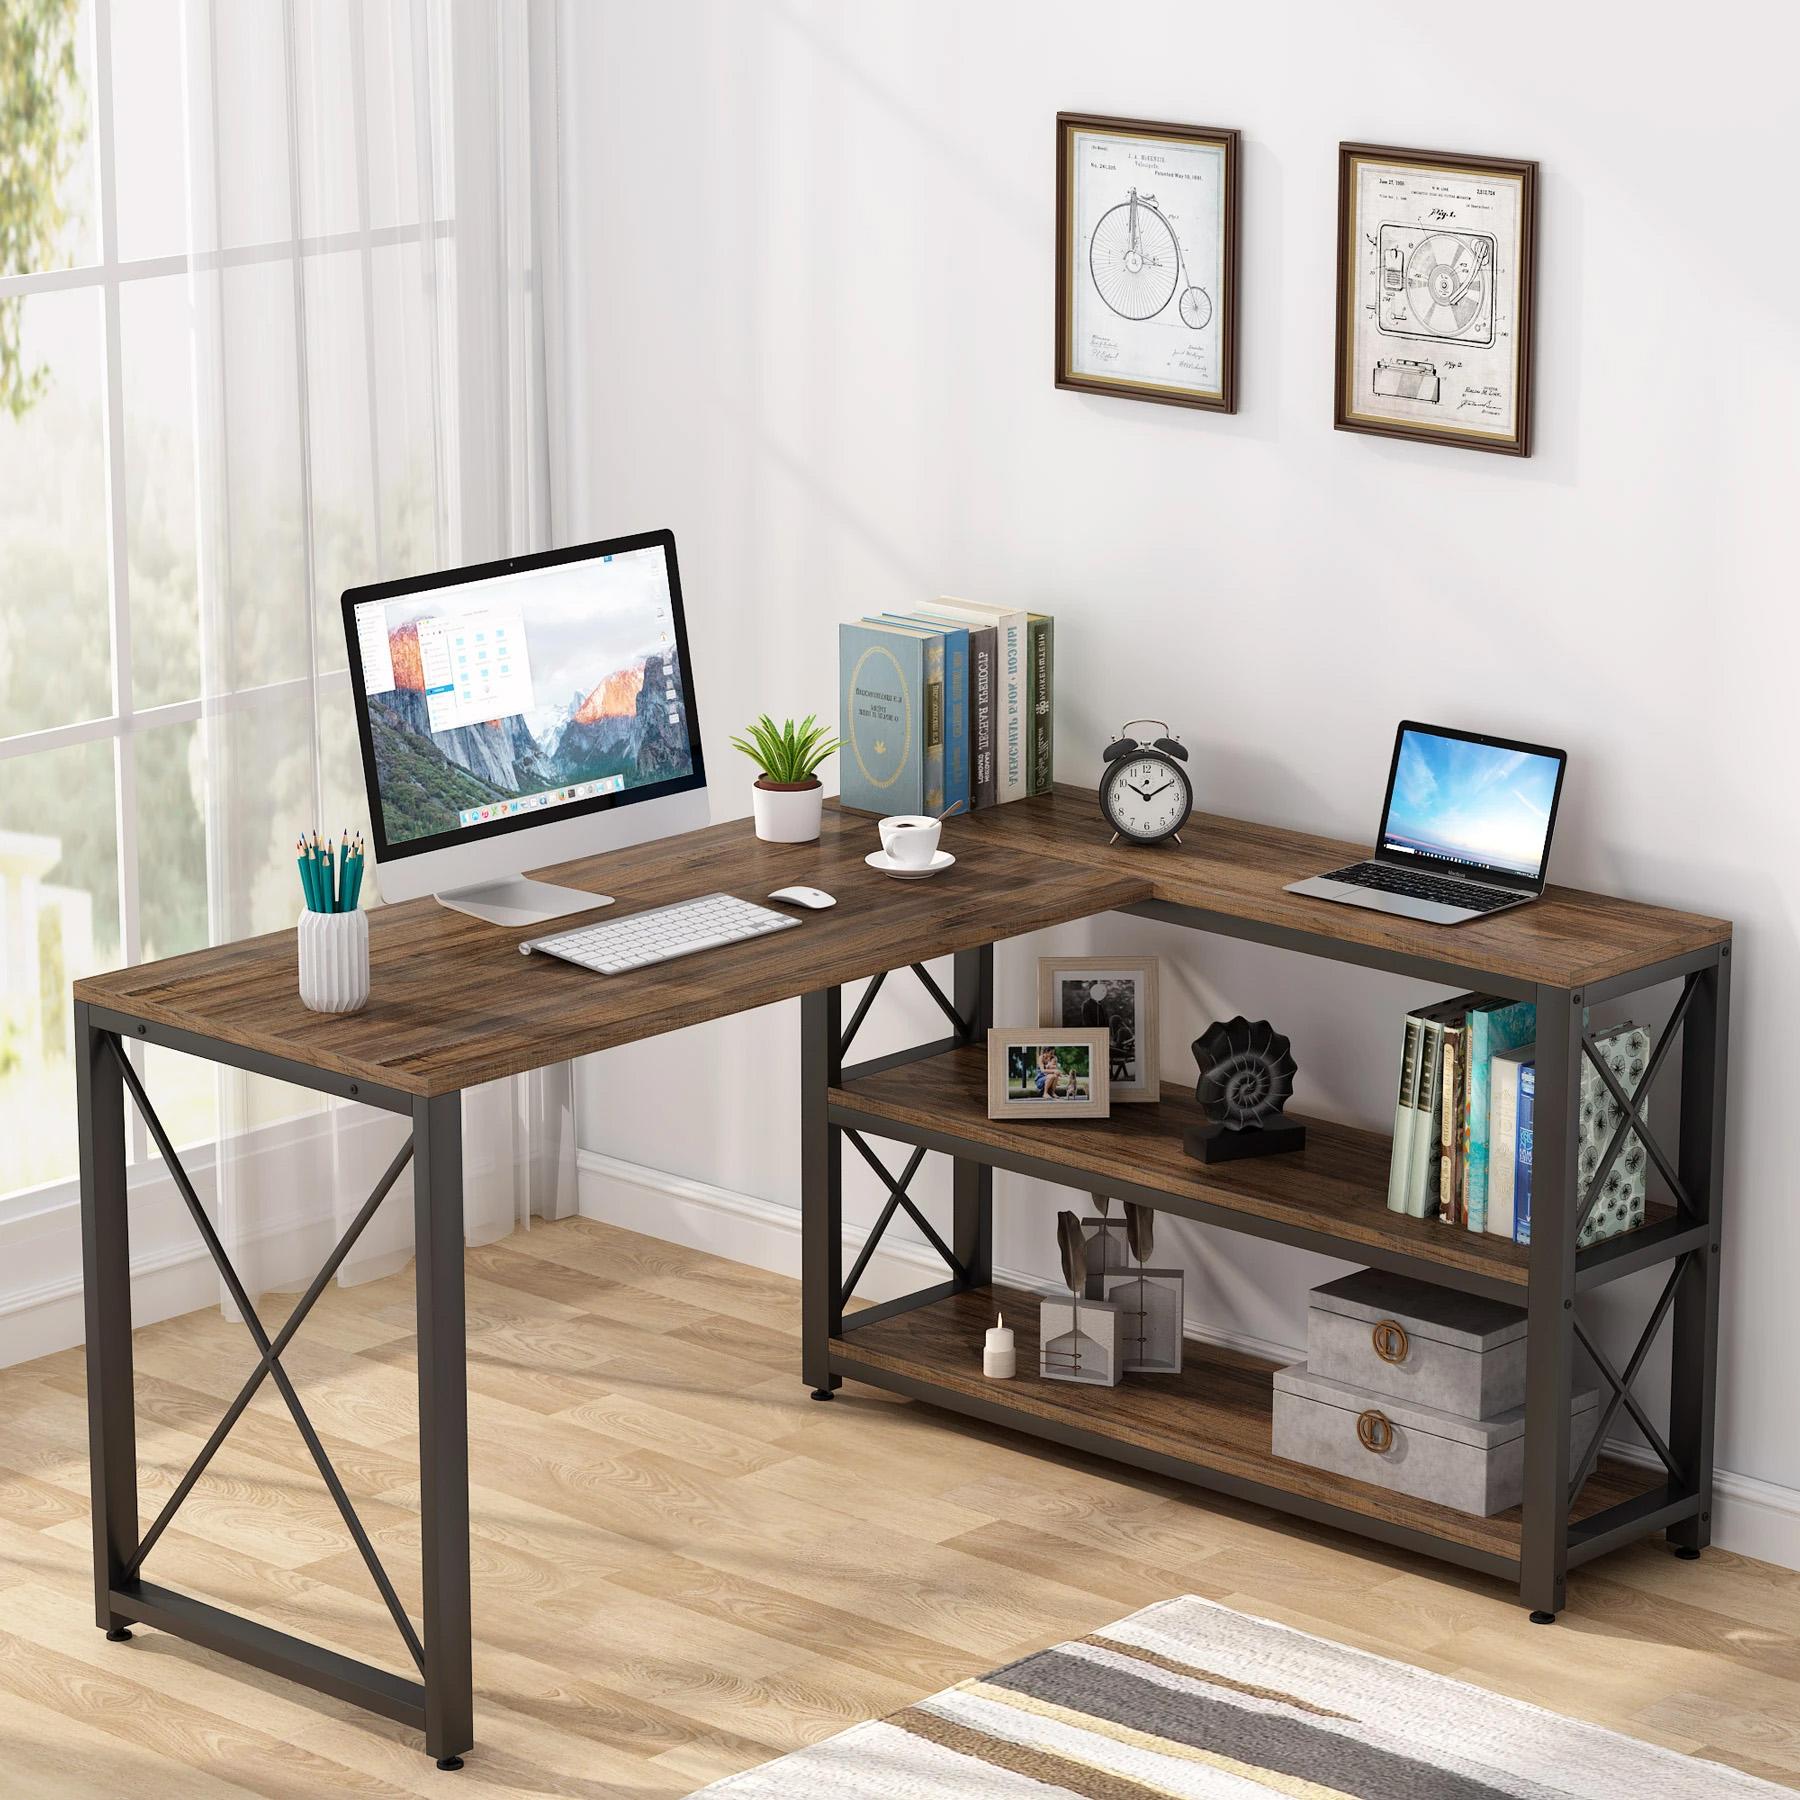 L Shaped Desk with Storage Shelves Corner Computer Desk PC Laptop Study Table